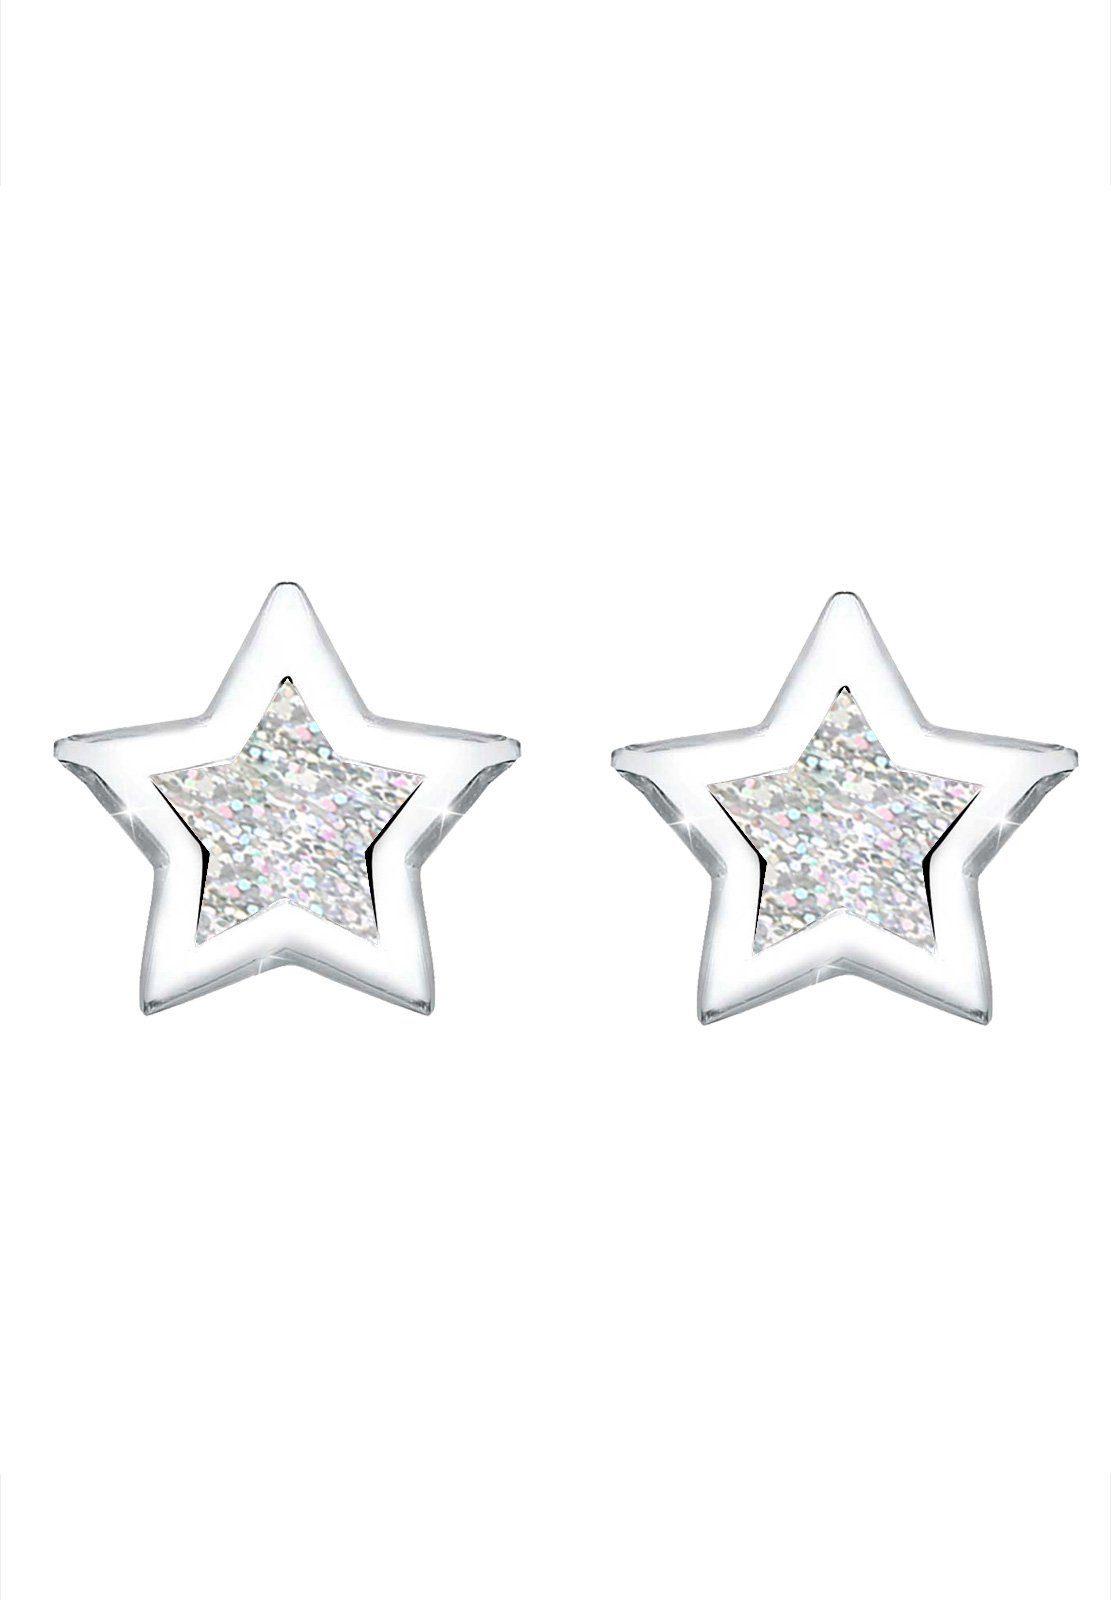 Online Elli Trend Kaufen Ohrringe »stern Astro Silber« Filigran 925 Emaille yv0OPmwN8n